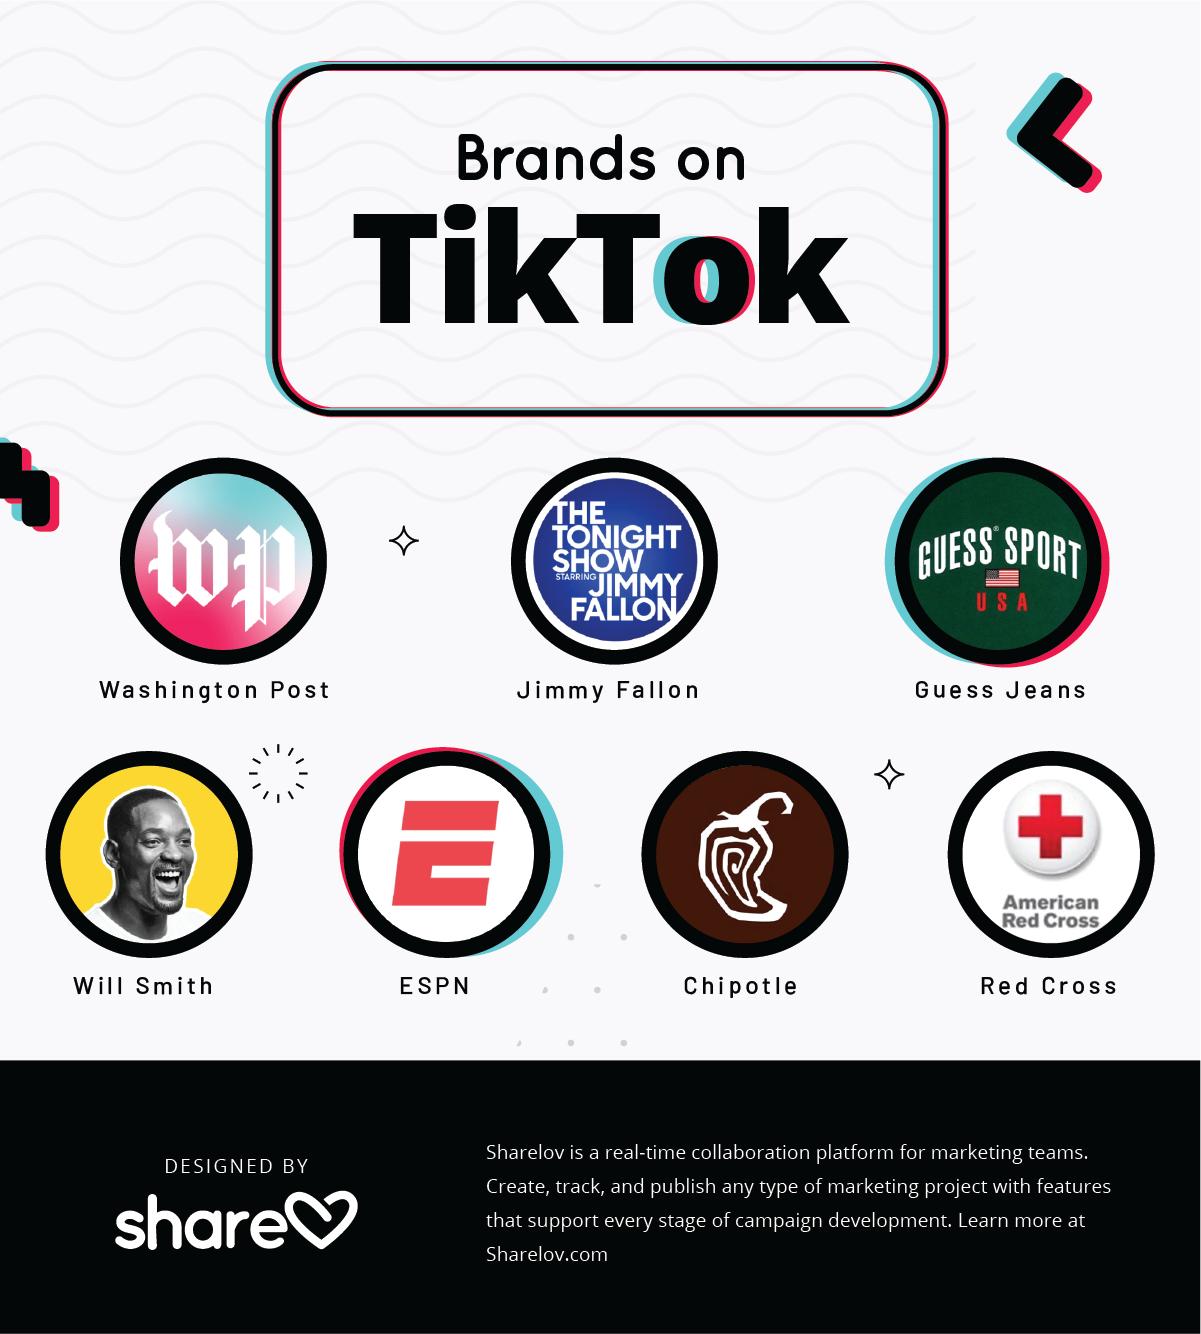 brands-on-TikTok